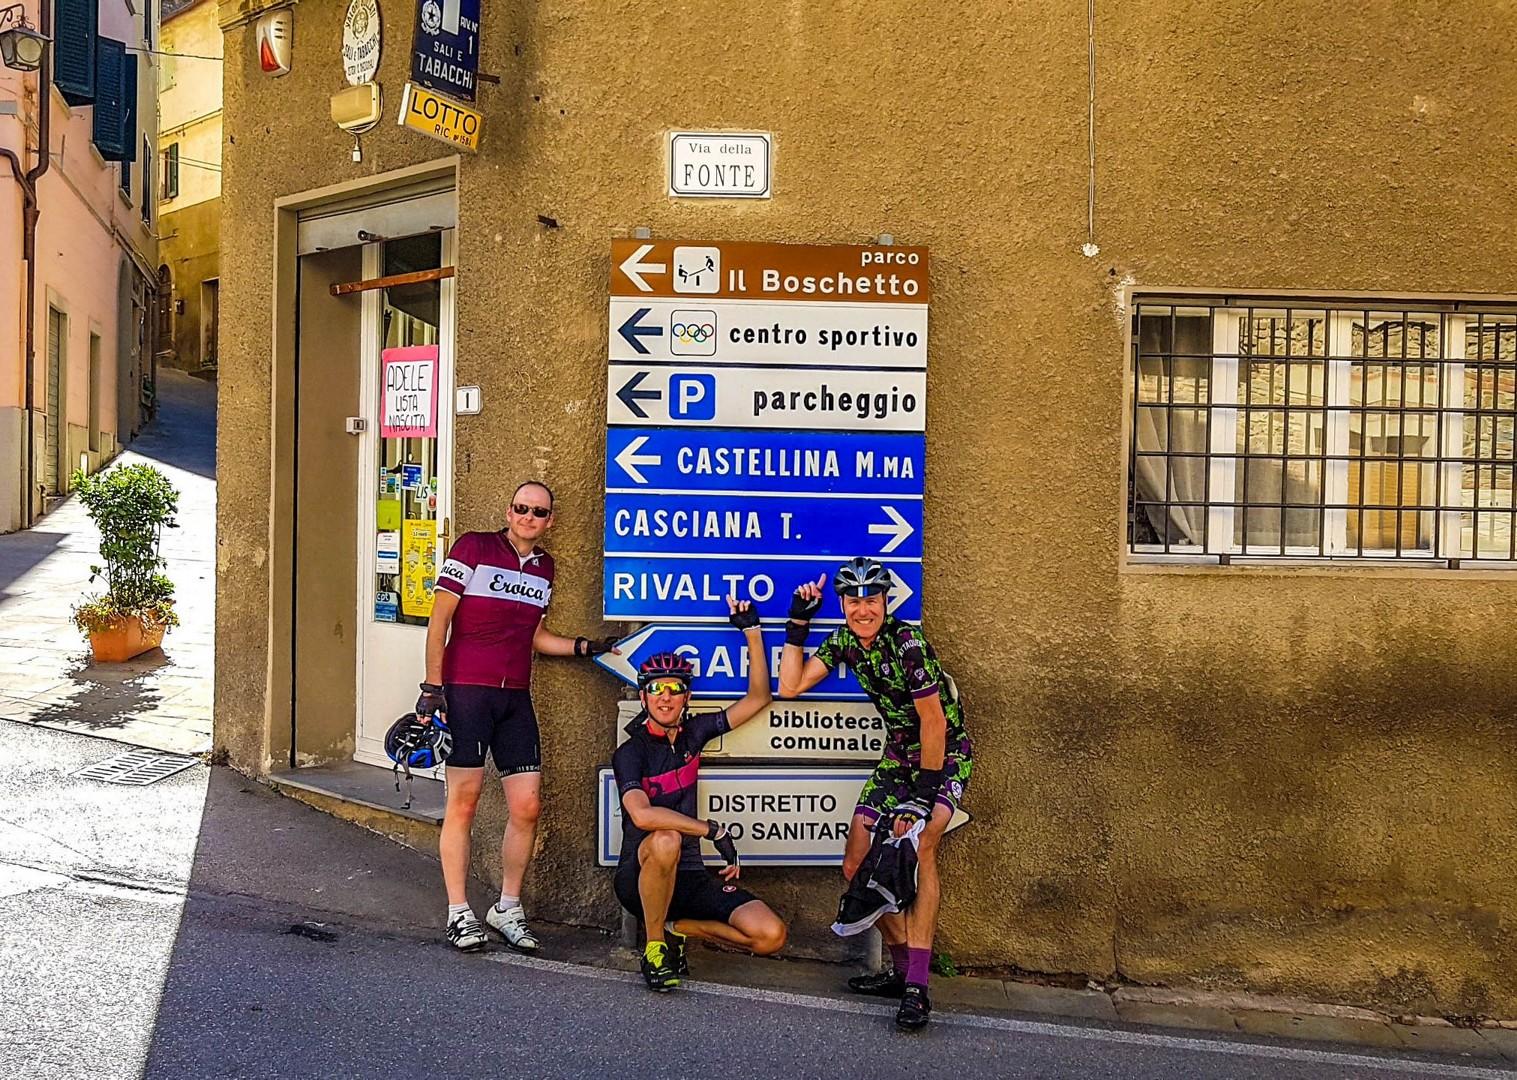 20170922_144954.jpg - Italy - Tuscany - Giro della Toscana - Guided Road Cycling Holiday - Road Cycling